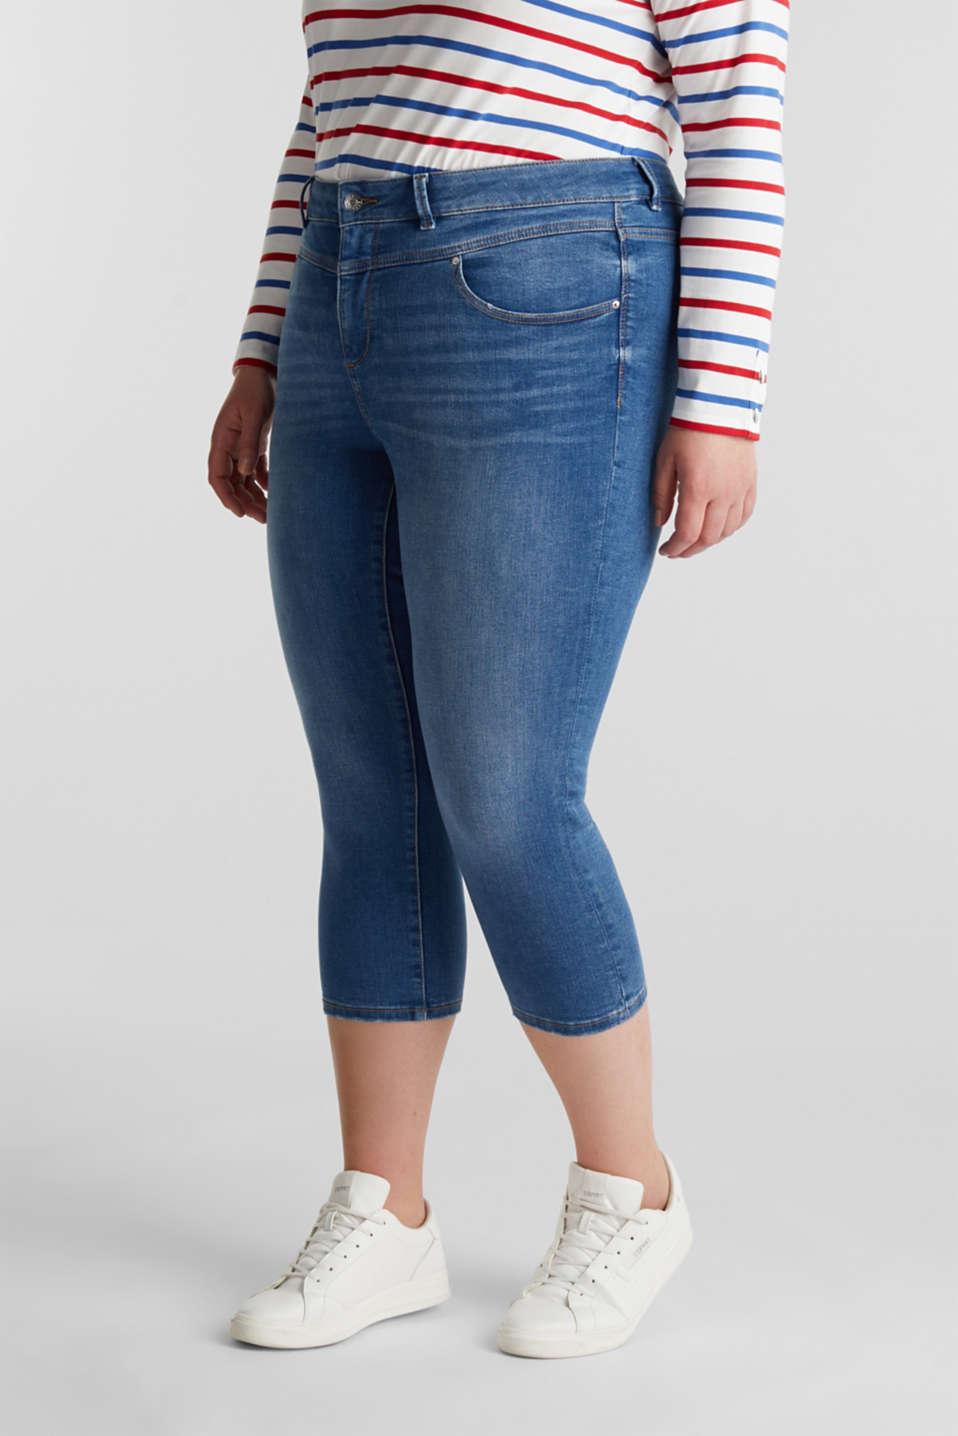 CURVY stretch capris jeans, BLUE MEDIUM WASH, detail image number 6